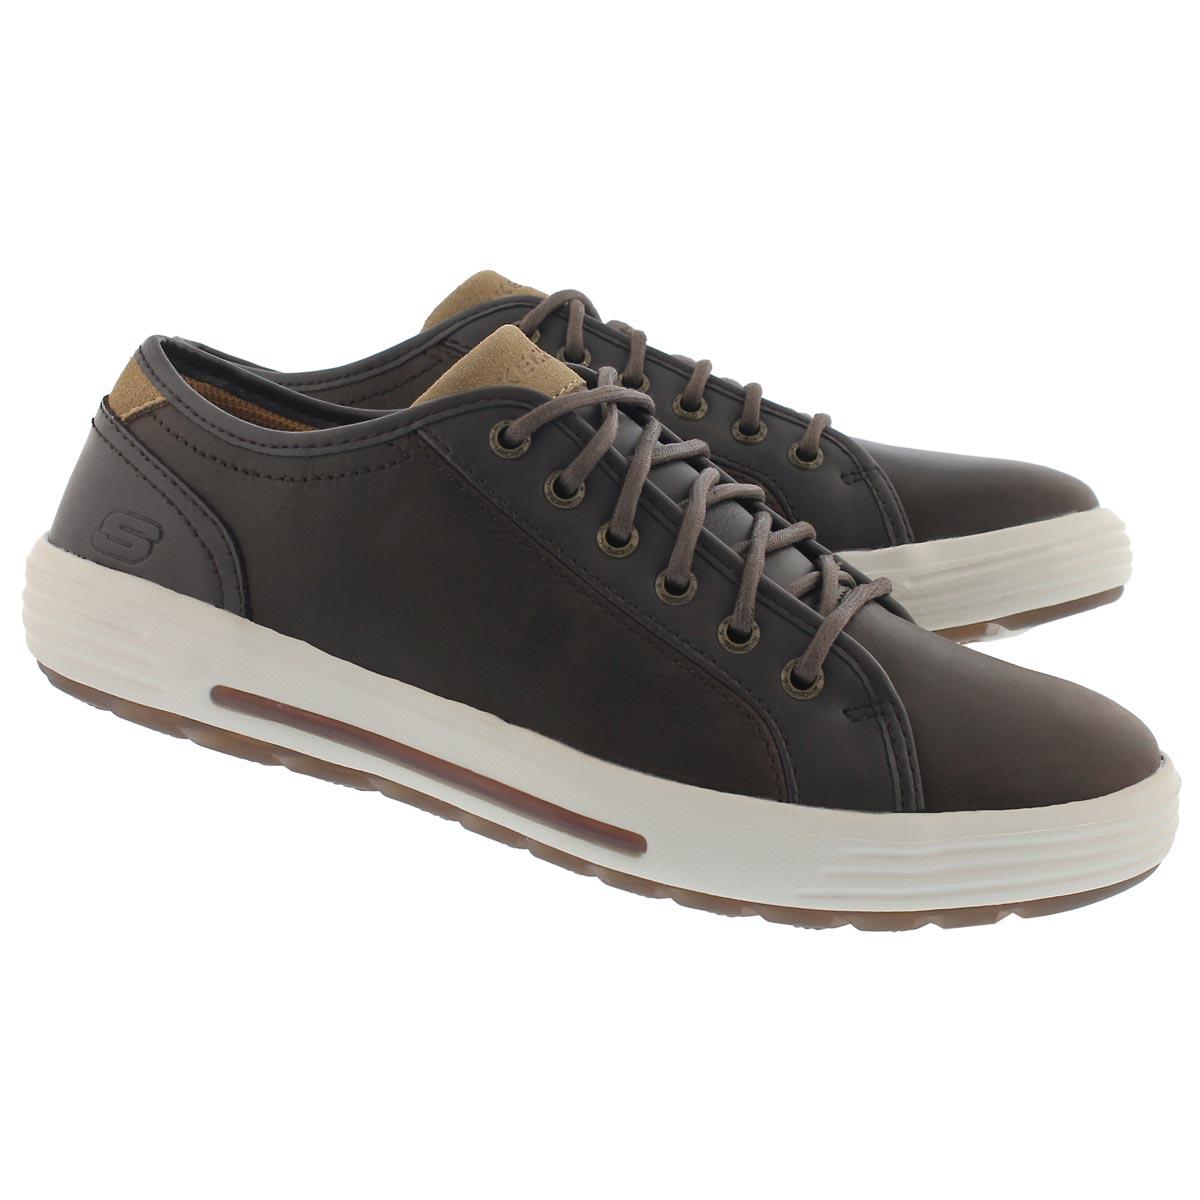 Mns Porter Ressen dk brn lace up sneaker